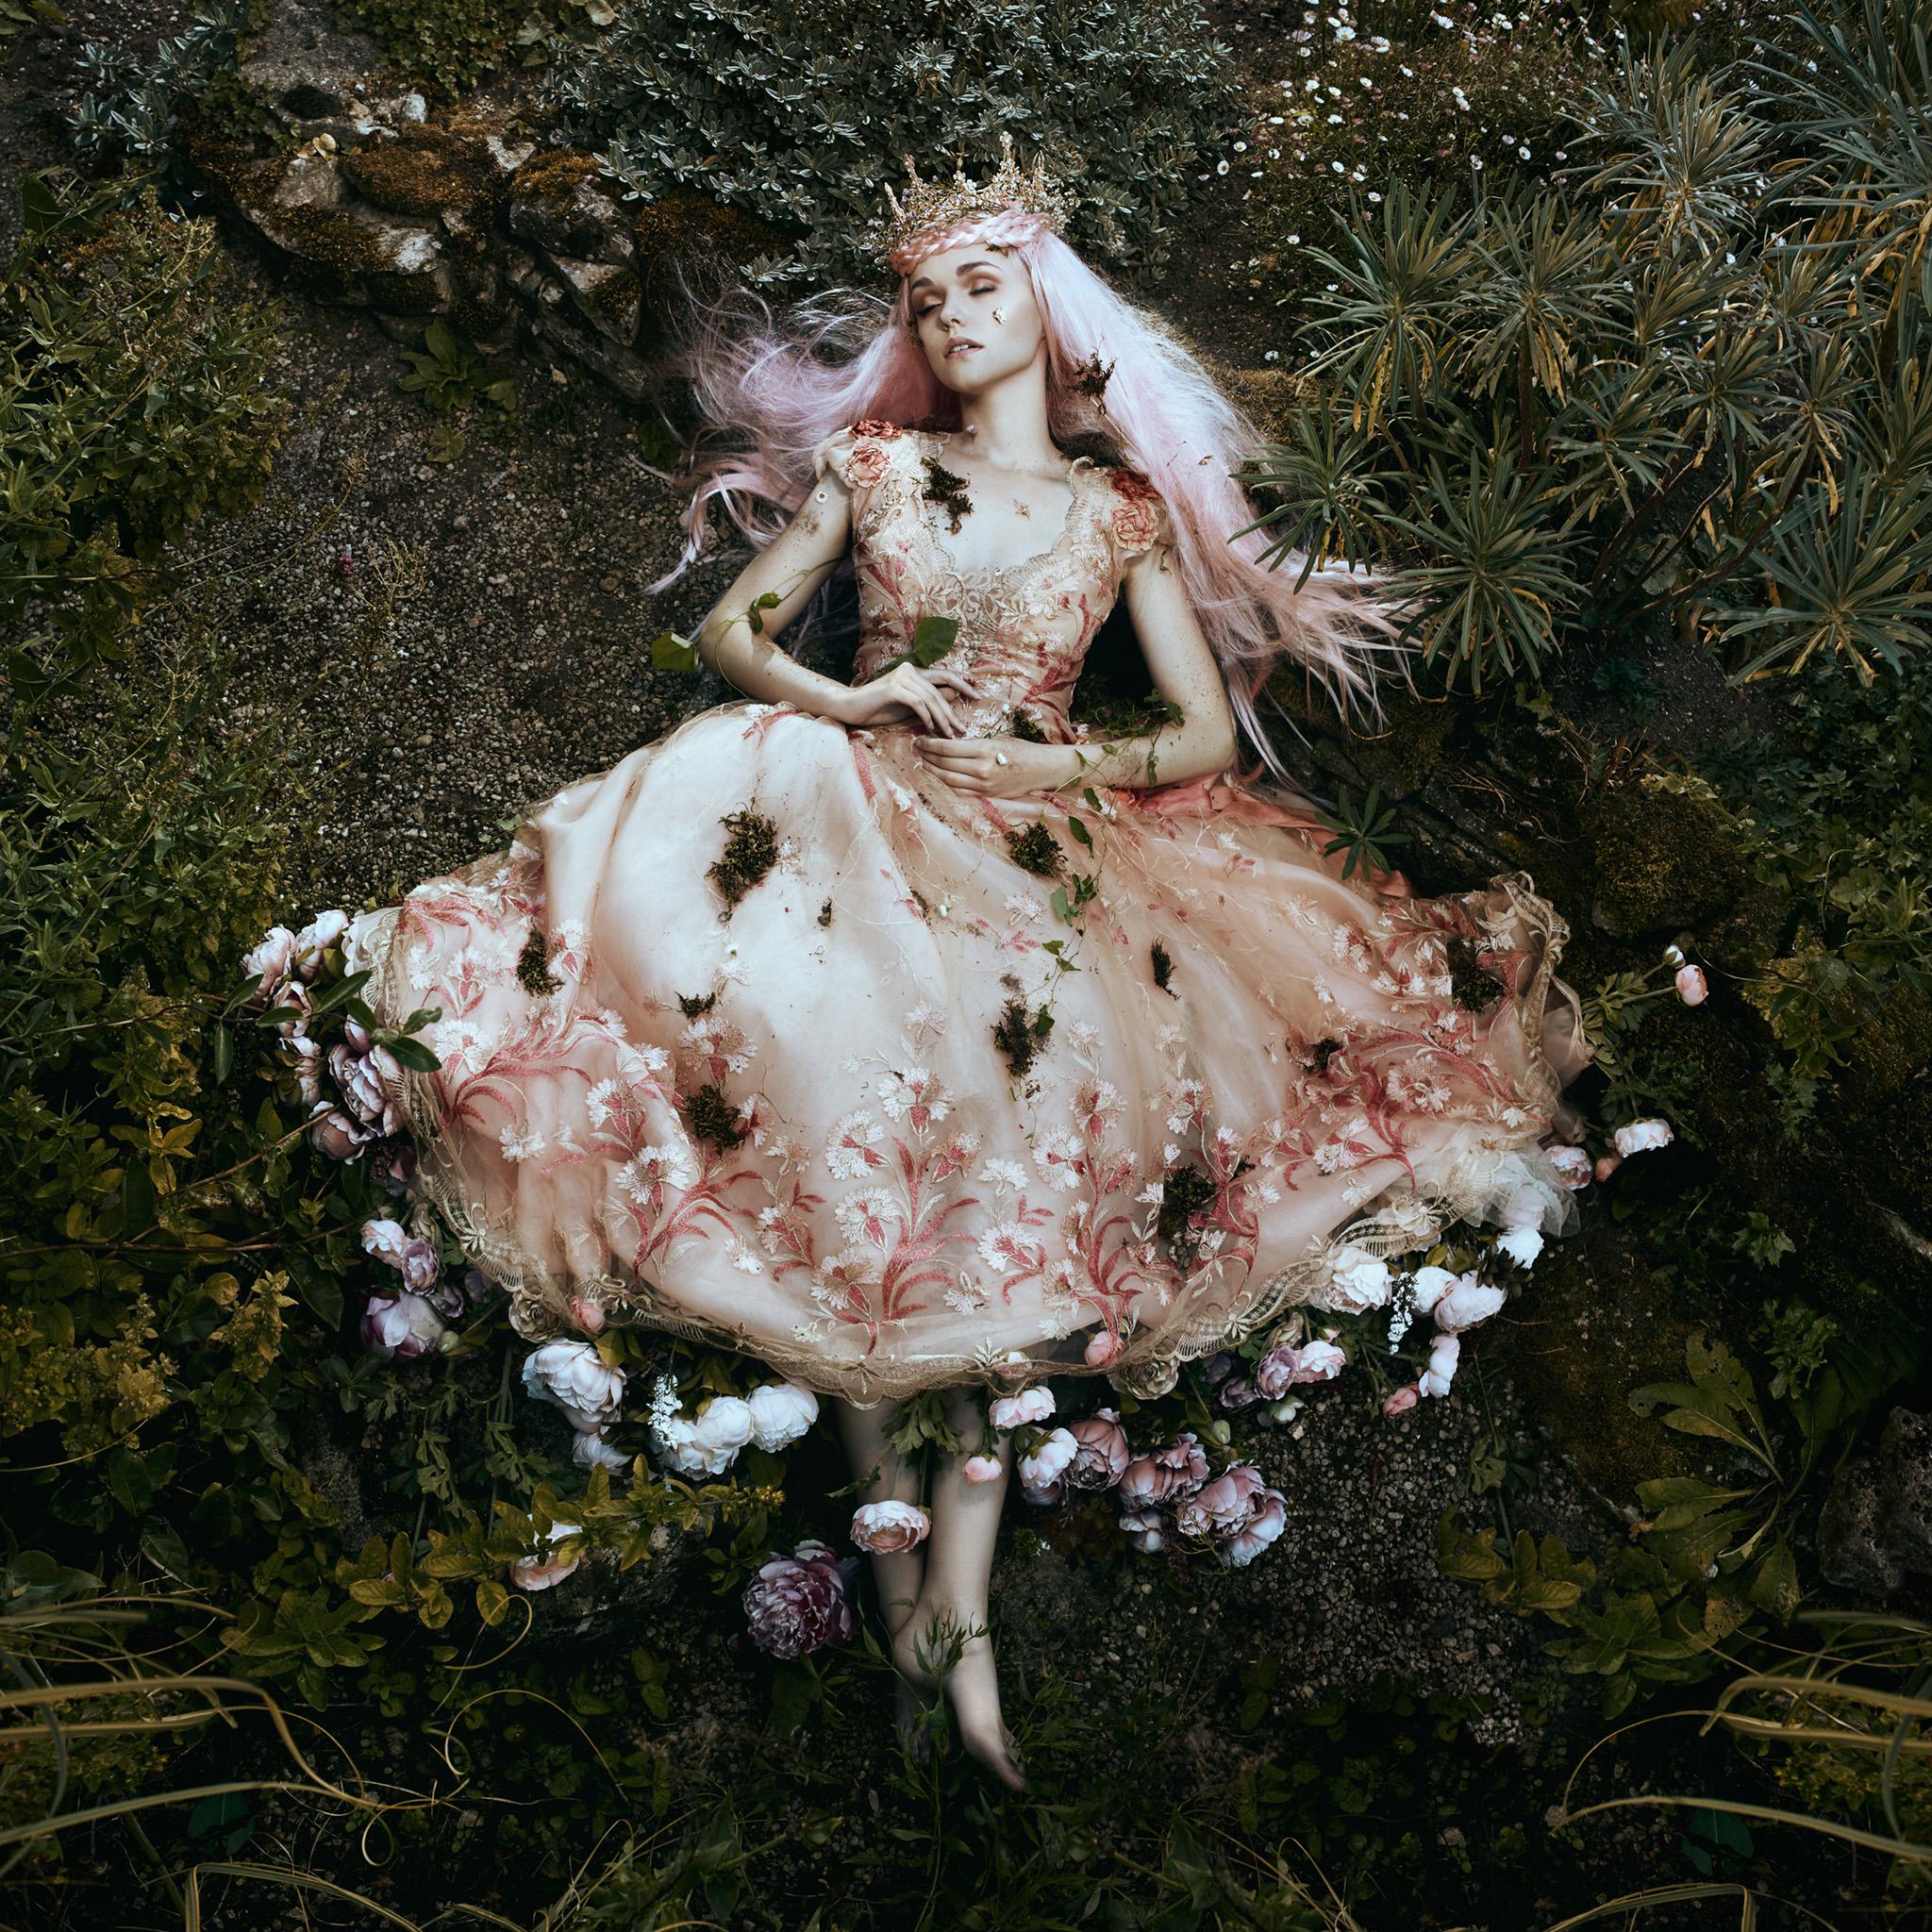 Bella_Kotak_Profoto_Canon_Fairytale_Fantasy_Photography_Portrait_Portraiture_Flowers_FLoral_Queen_Princess_Disney_Fashion_Editorial_A1_Lighting_Pink_Hair_Magical_Ethereal_Solstice_Retouch_5.jpg